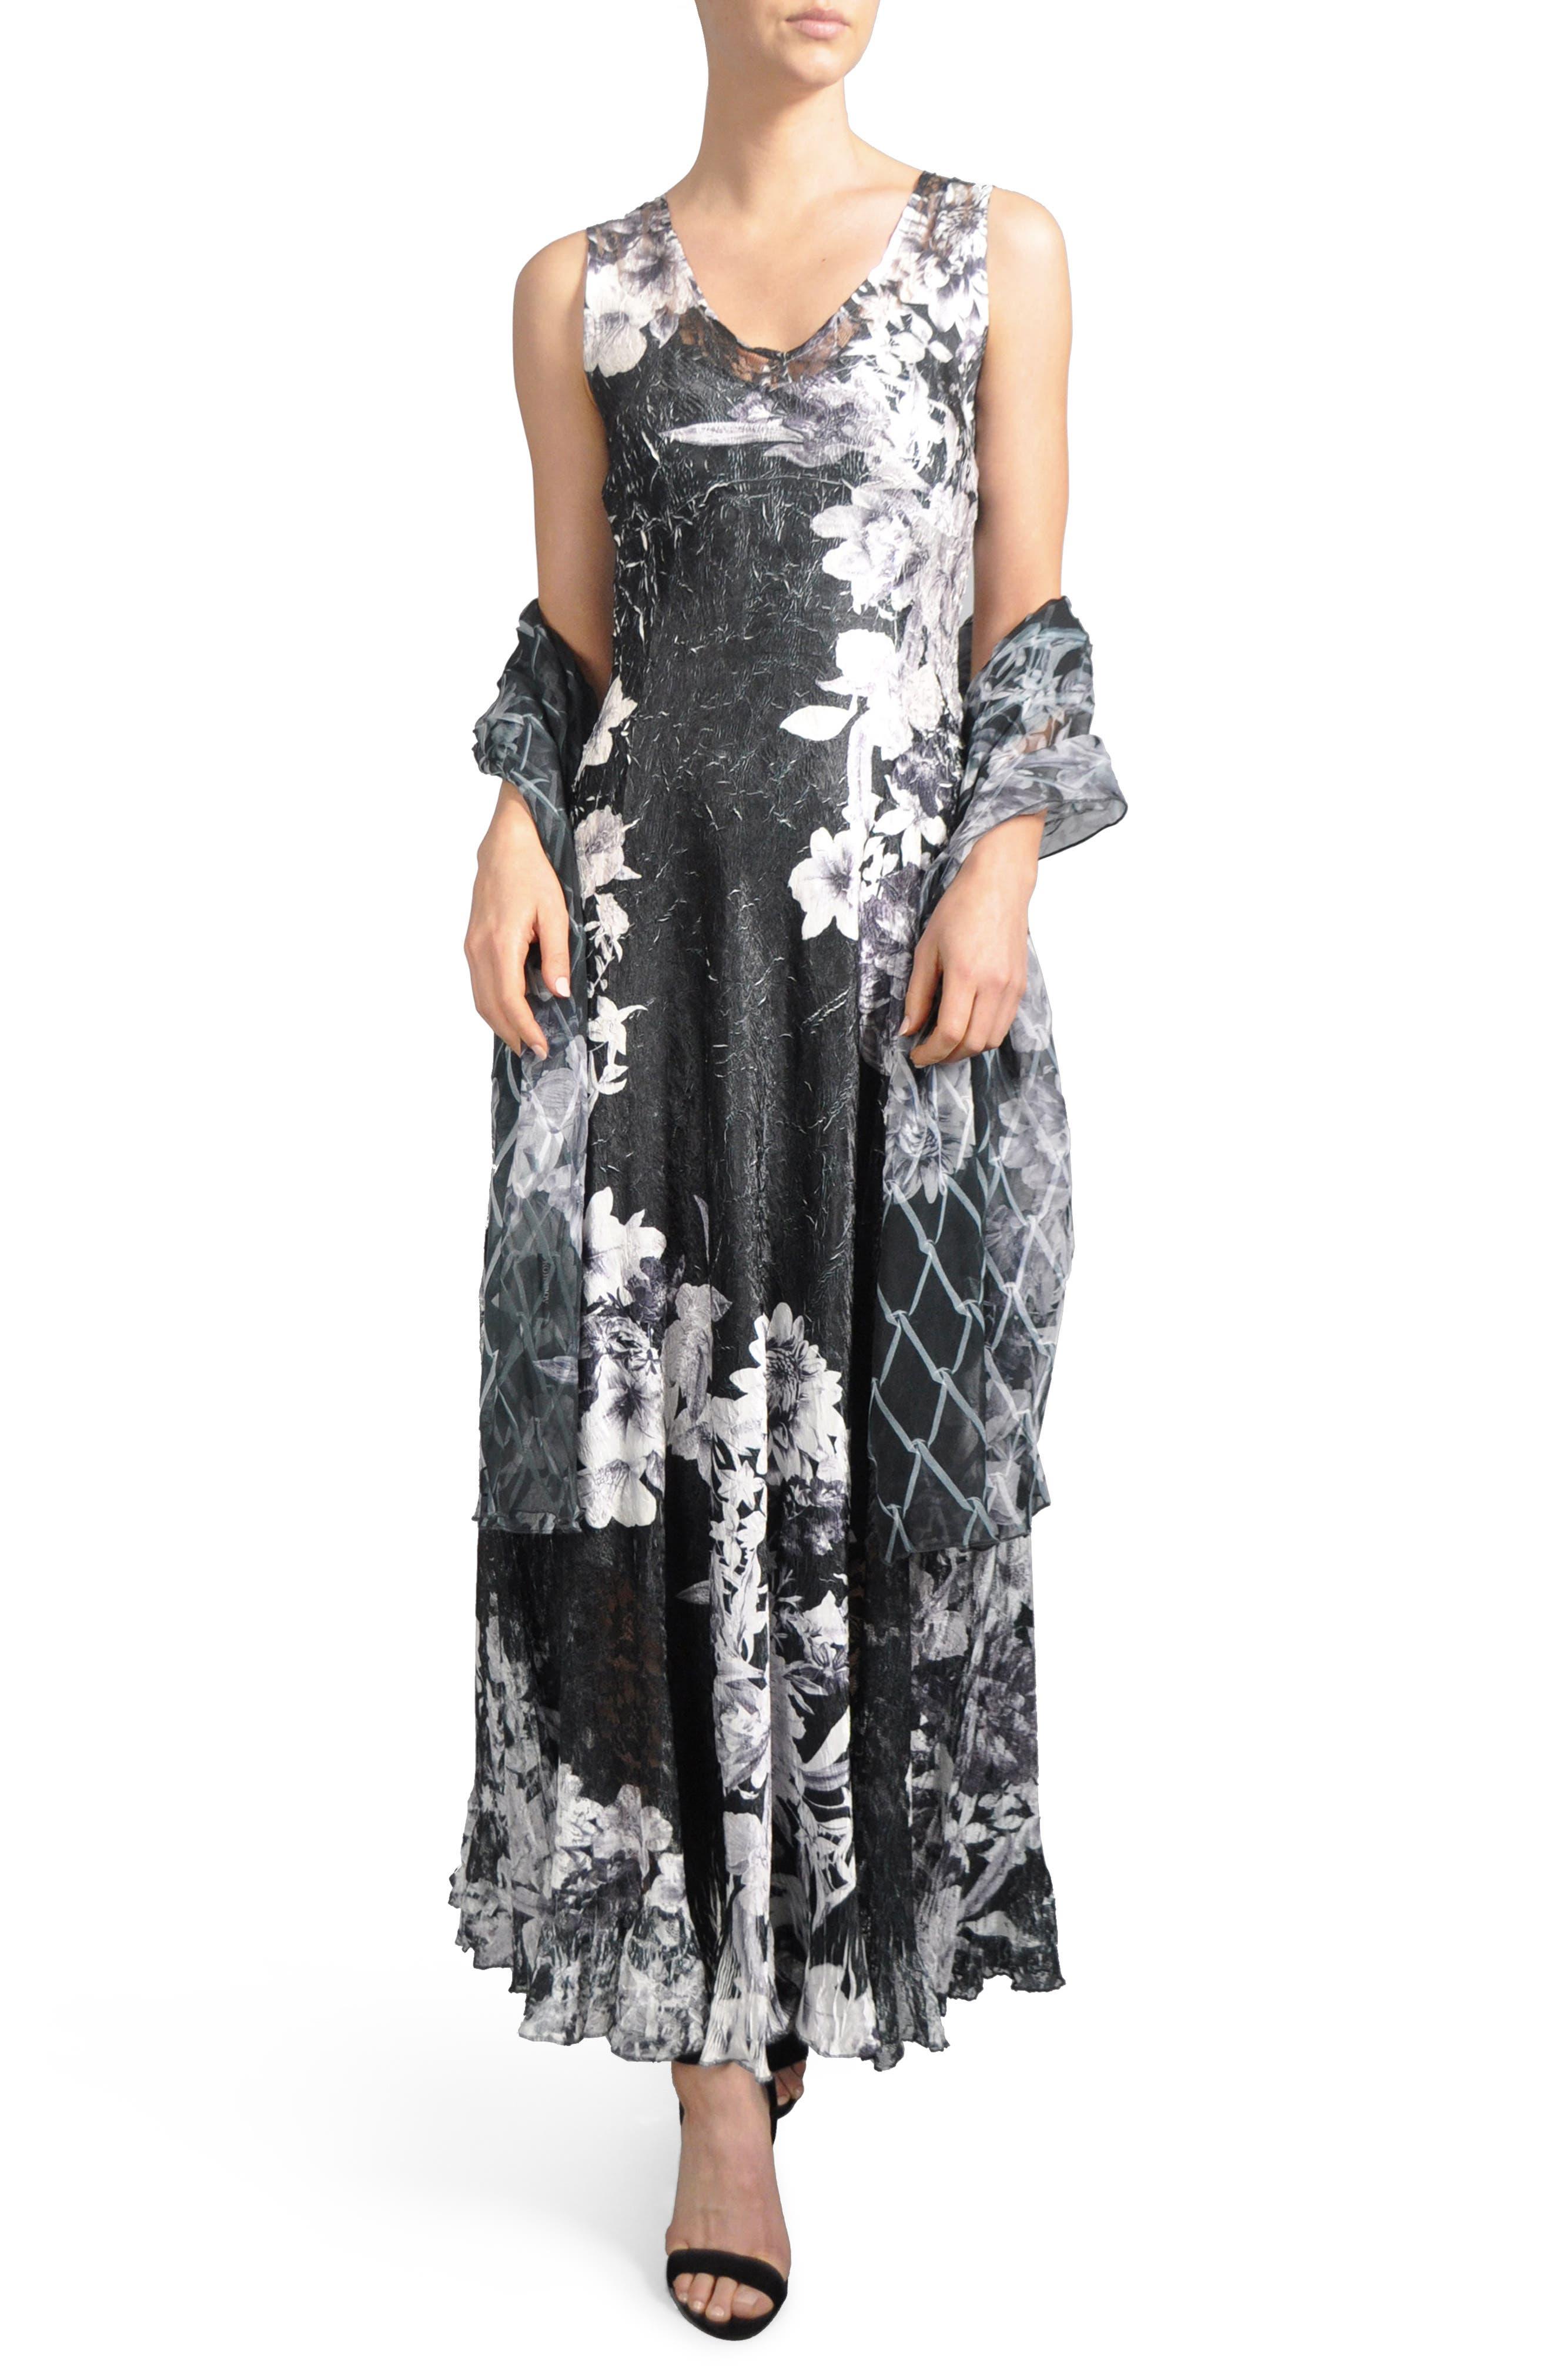 Alternate Image 1 Selected - Komarov Lace-Up Back Dress with Wrap